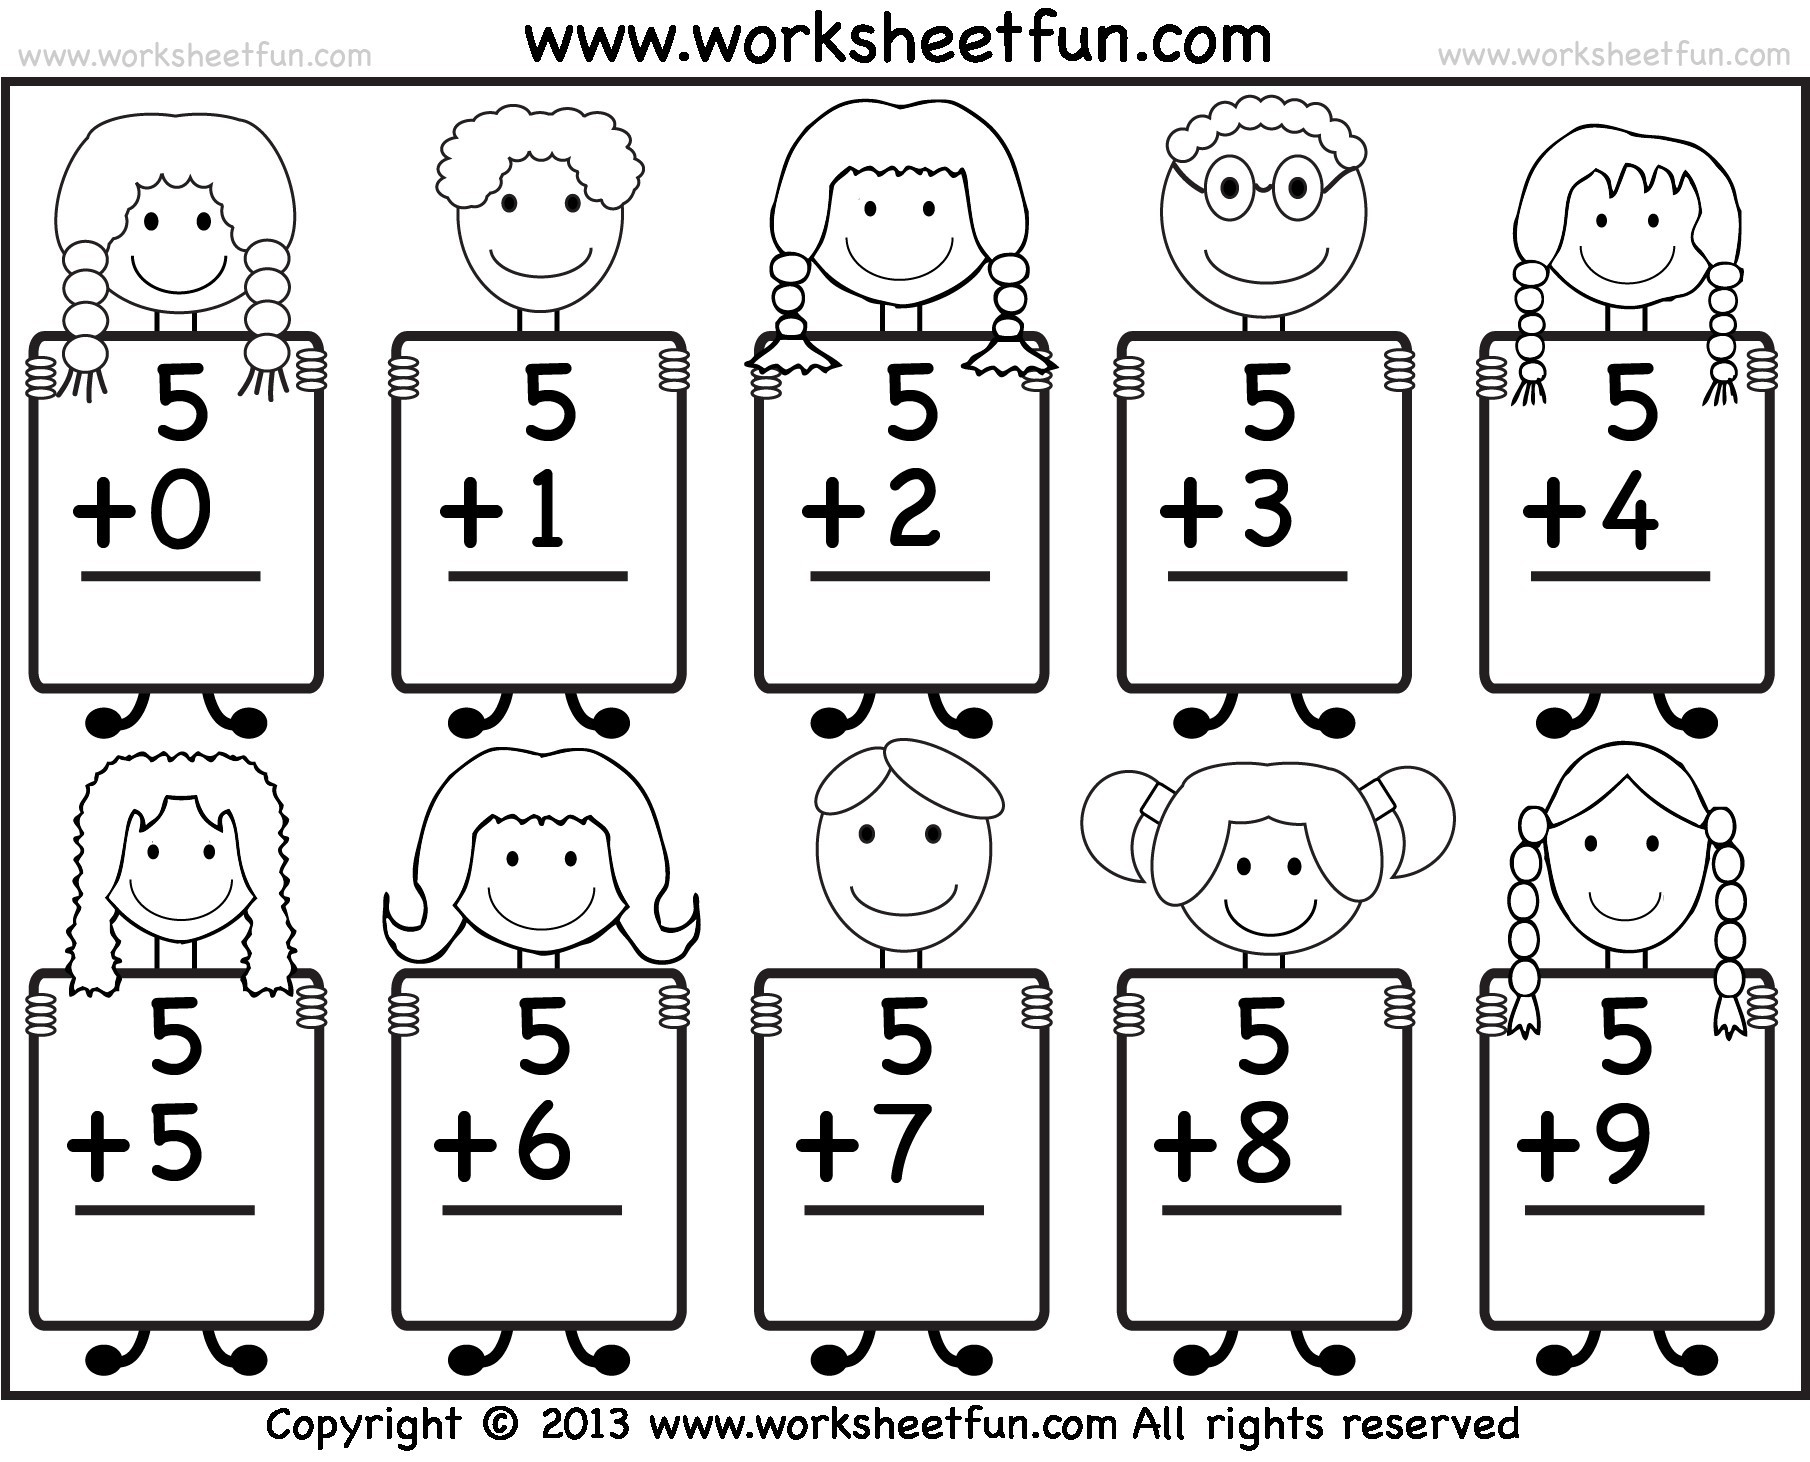 Free Printable Preschool Math Worksheets Download Free   Free - Free Printable Preschool Math Worksheets